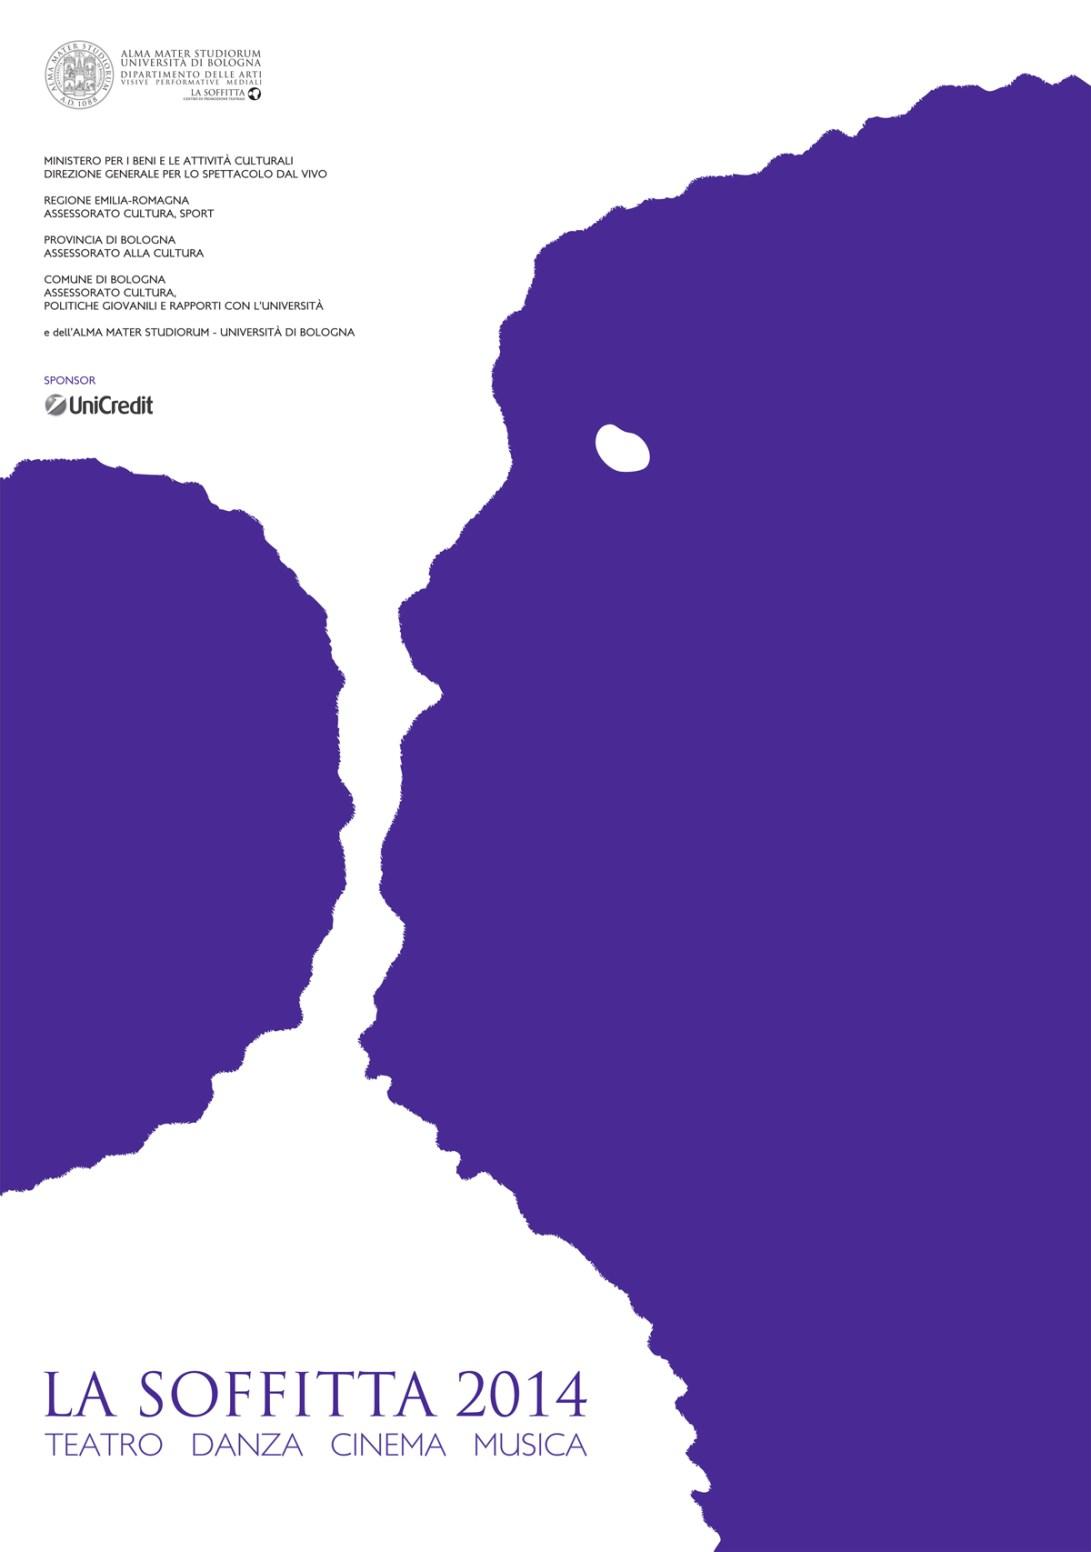 La Soffitta 2014 - SARA GARAGNANI